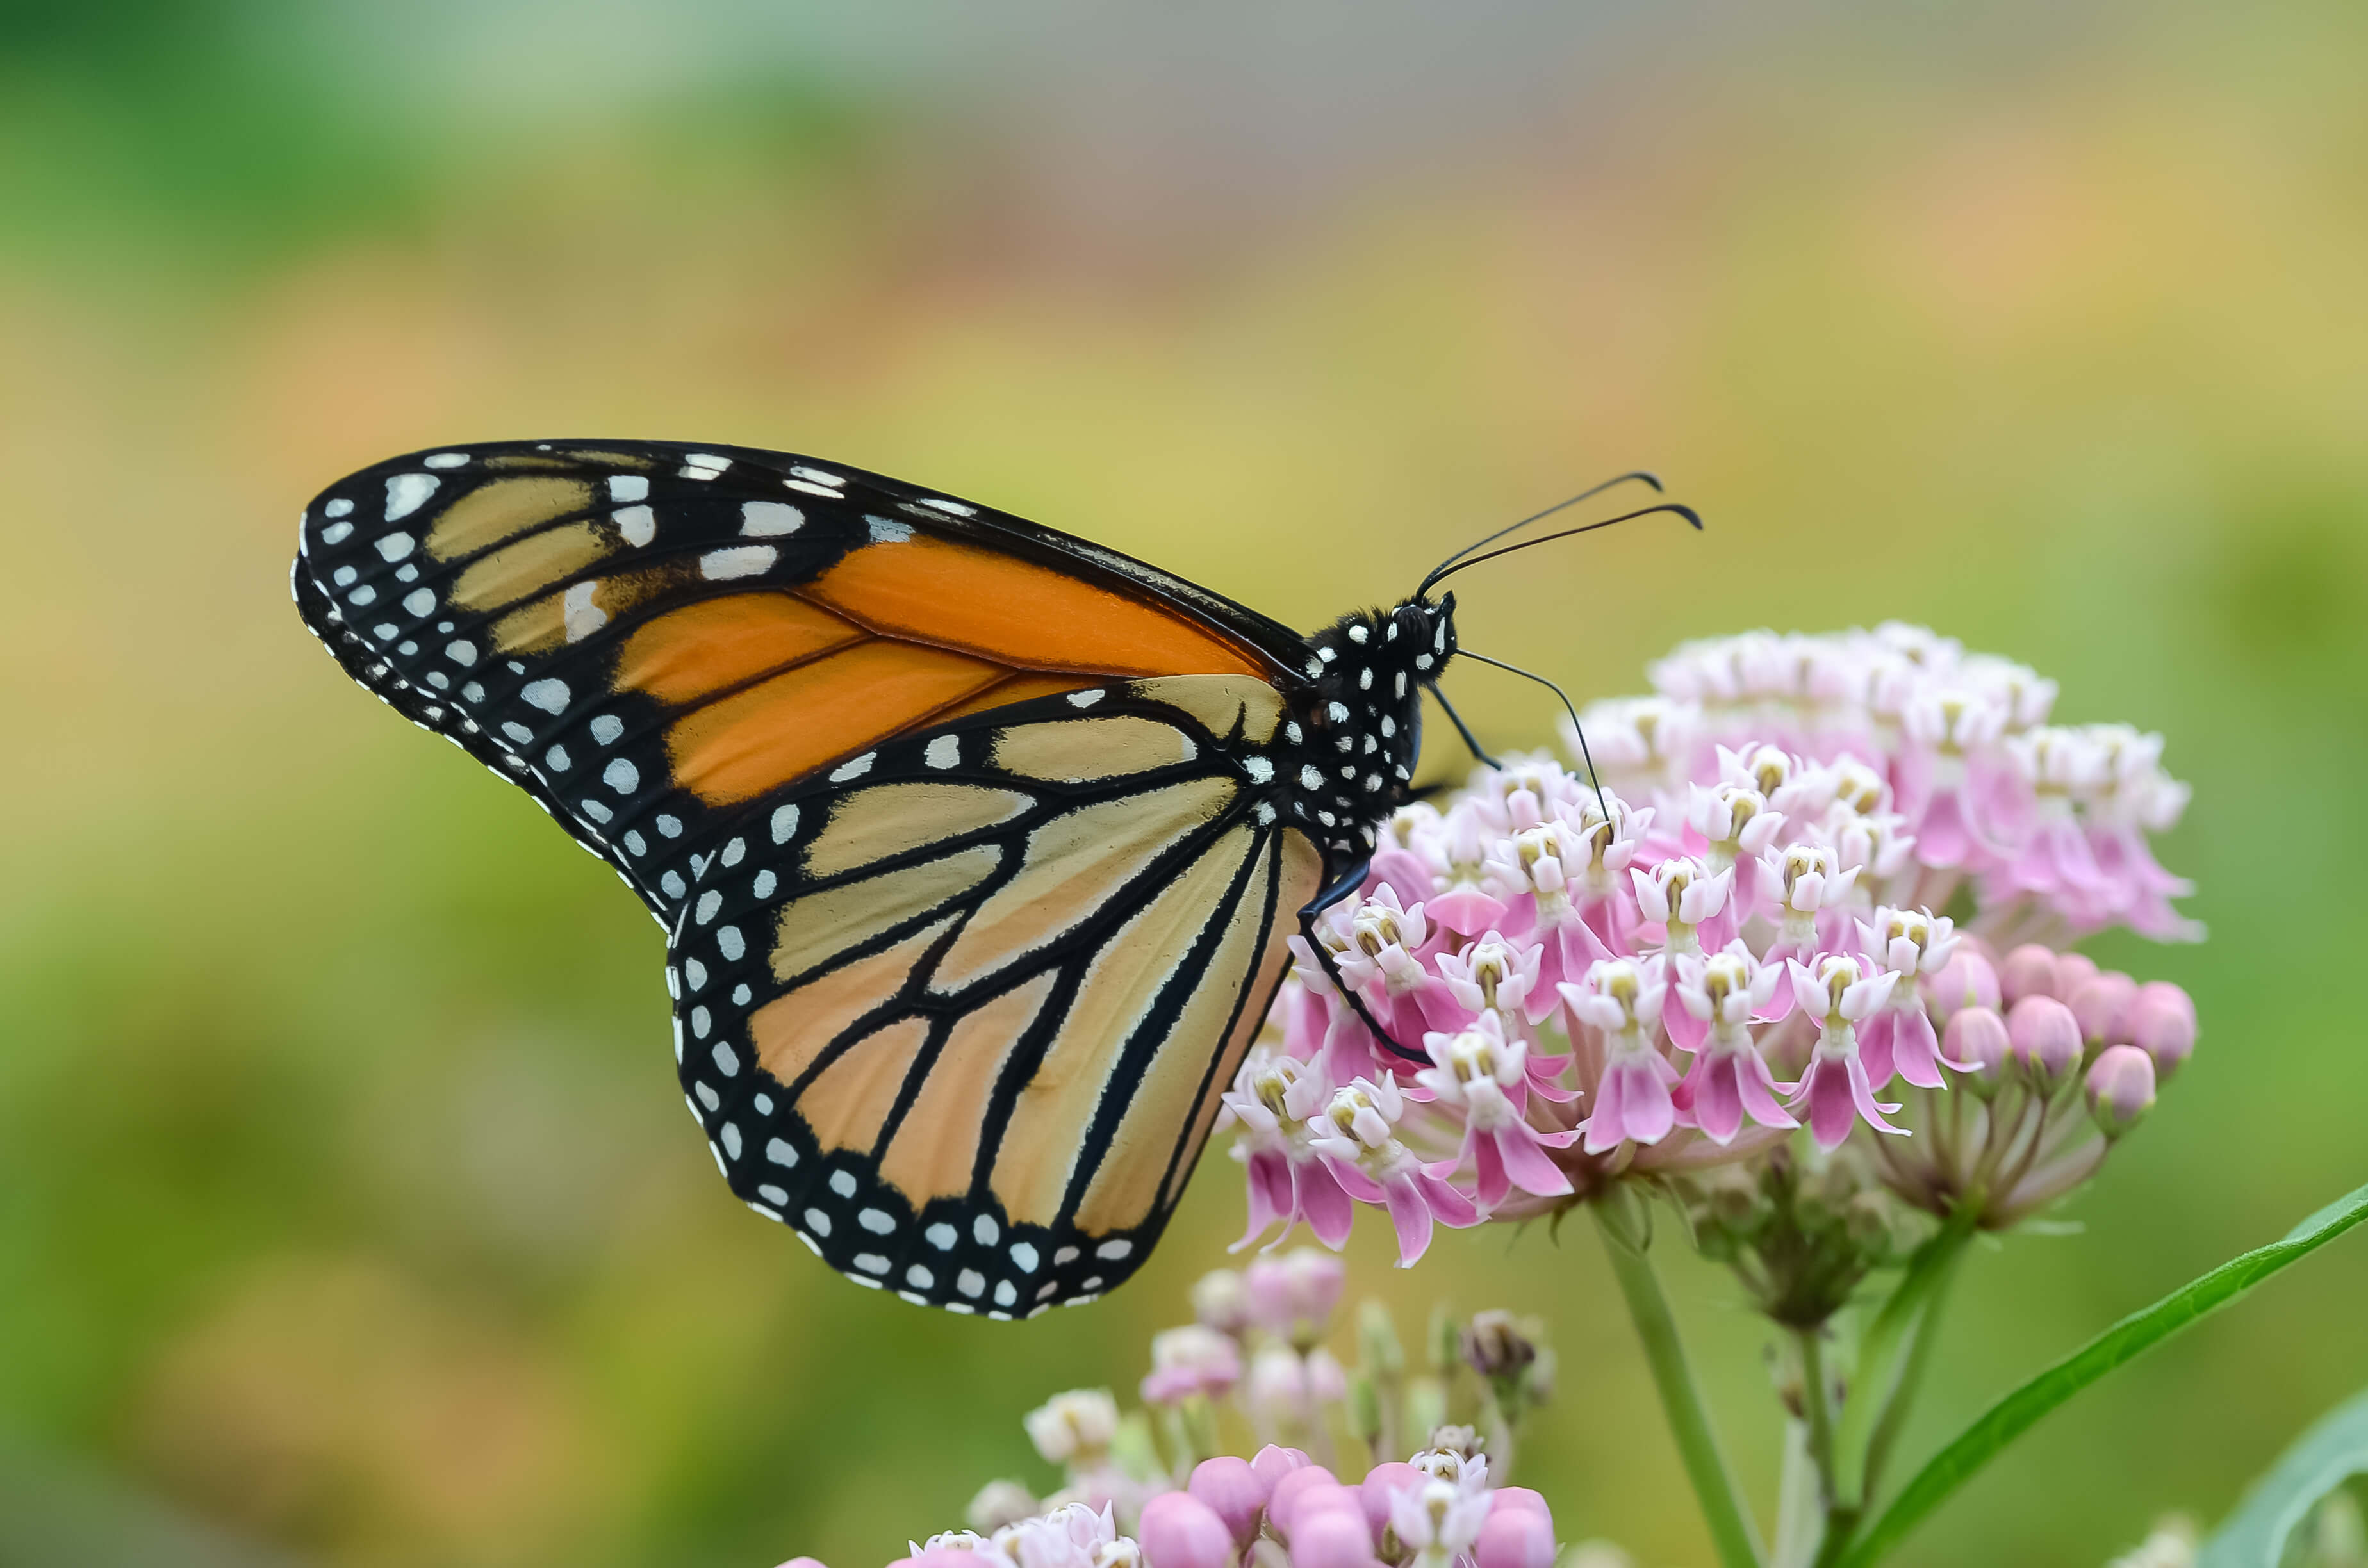 orange and black butterfly on pink milkweed flower